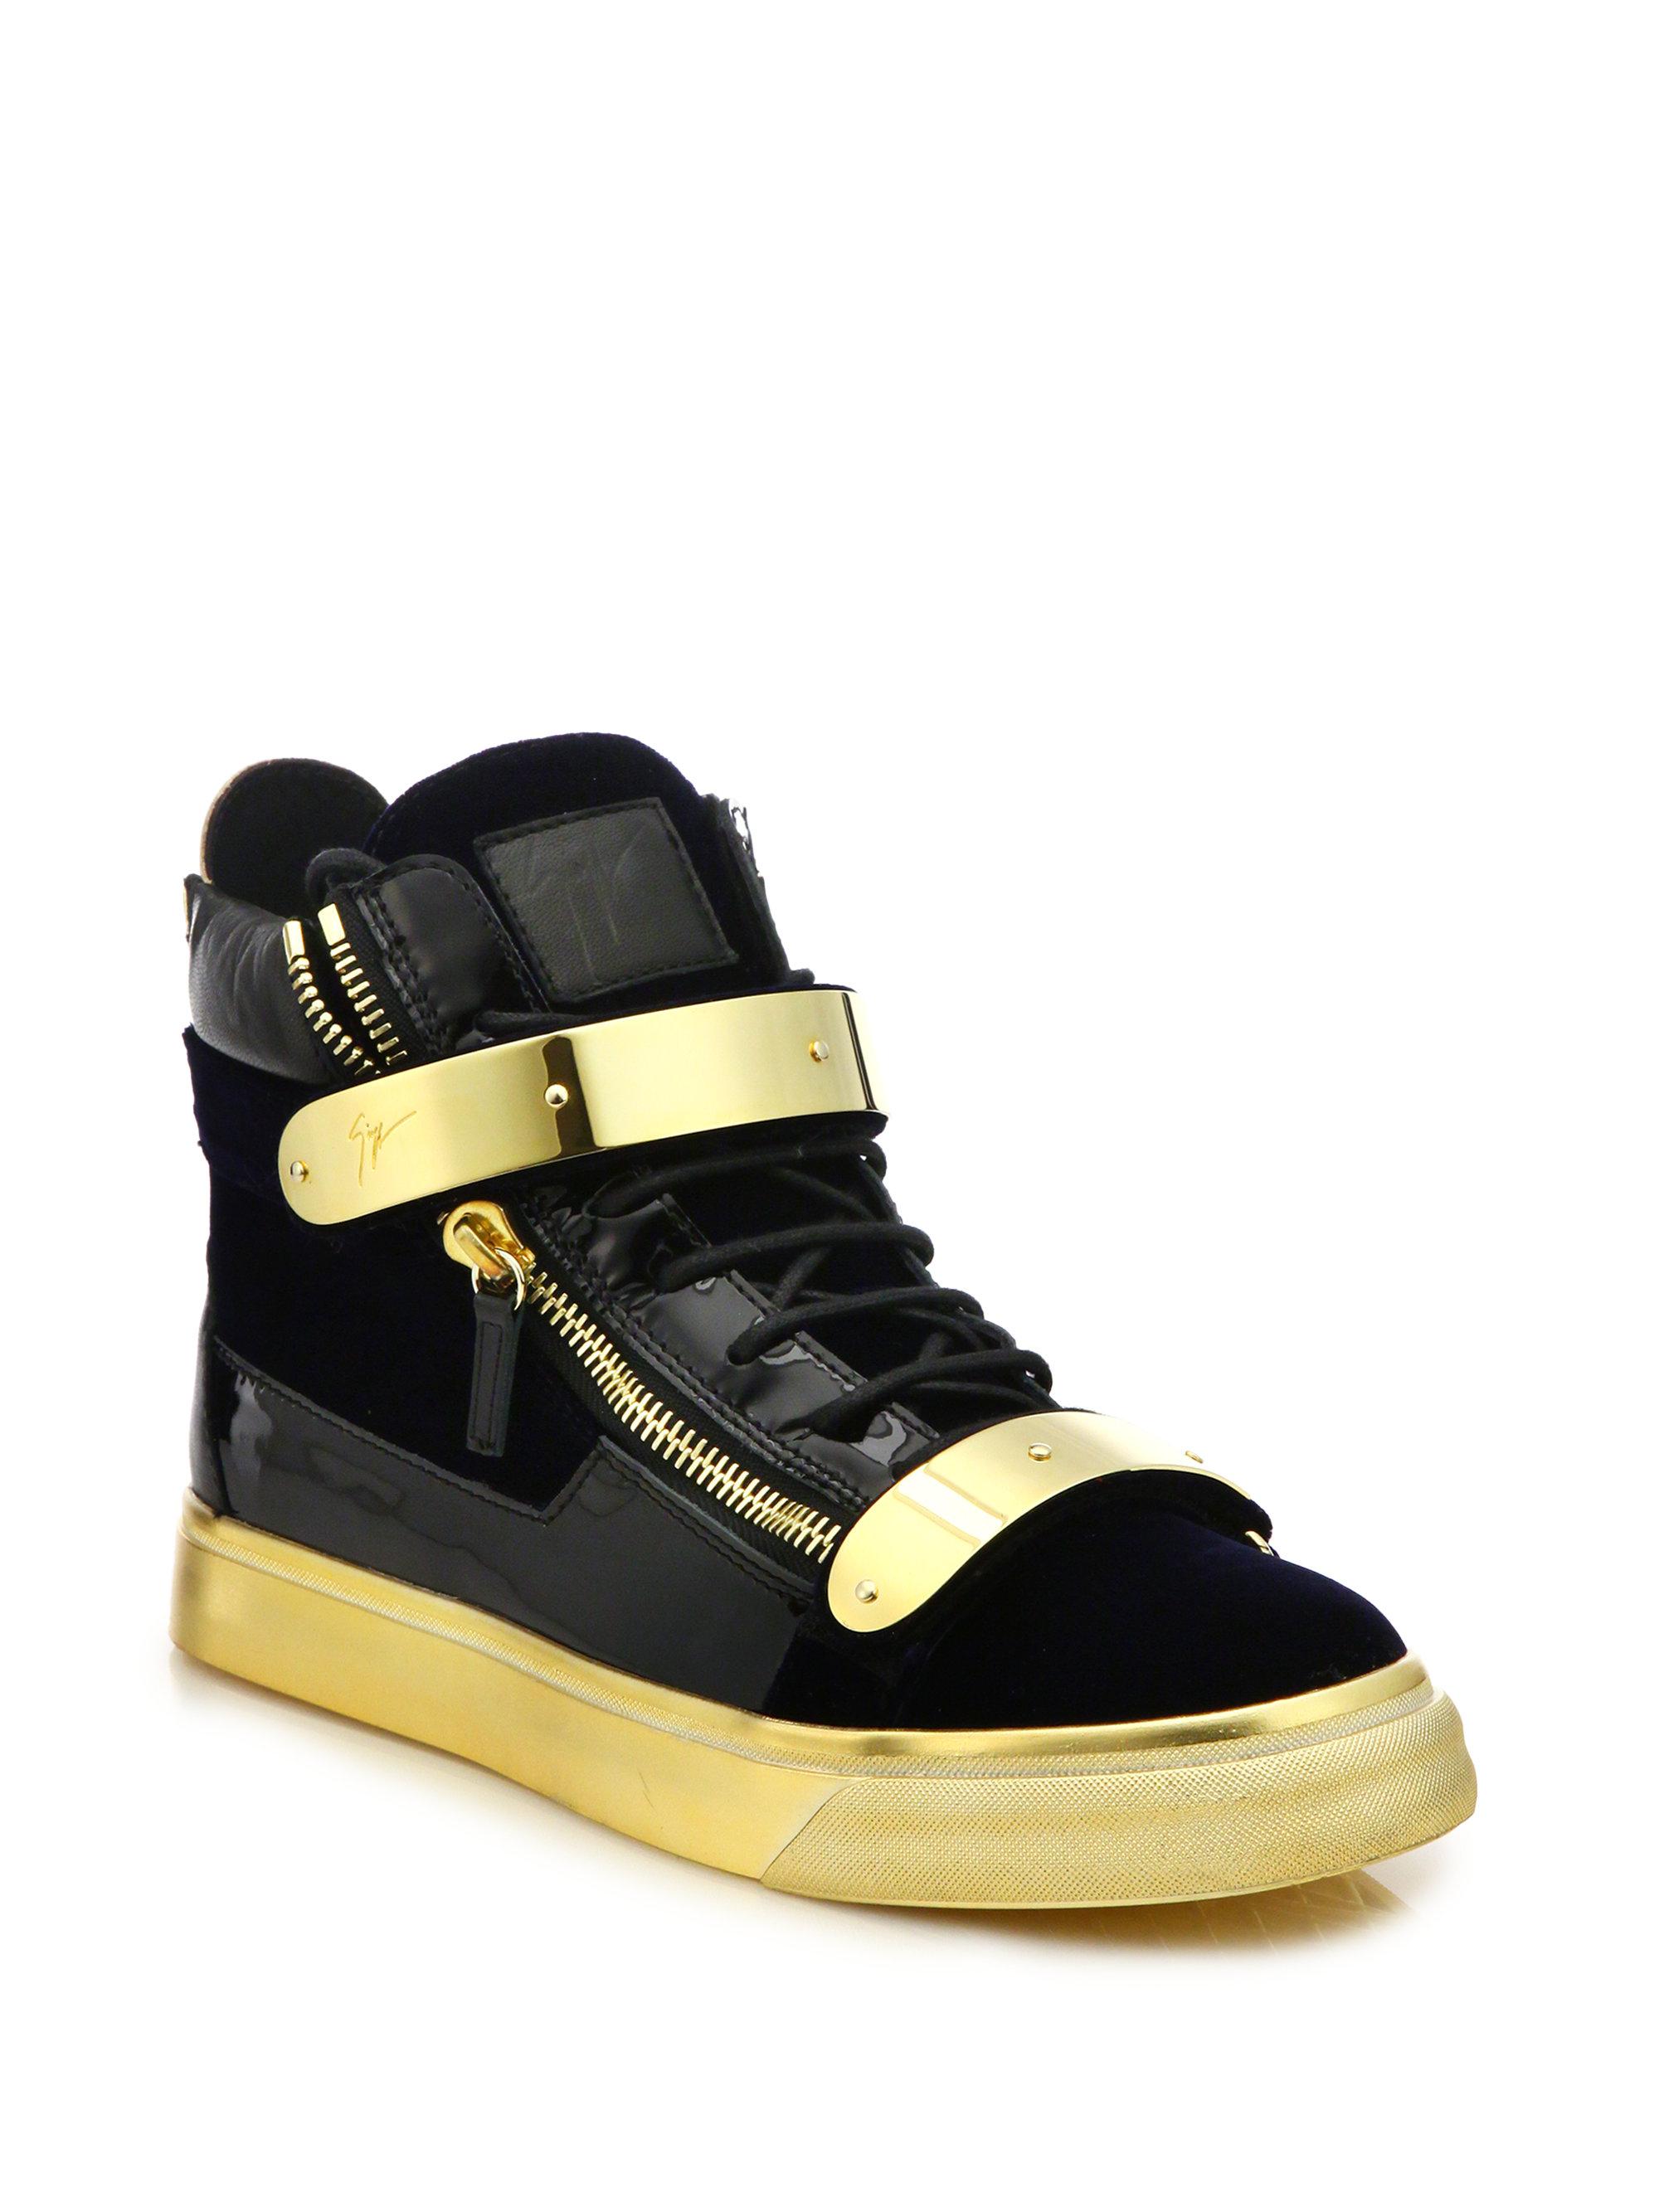 39462d5d4fb7 Lyst - Giuseppe Zanotti Double Zip Velvet Metallic High-top Sneakers ...